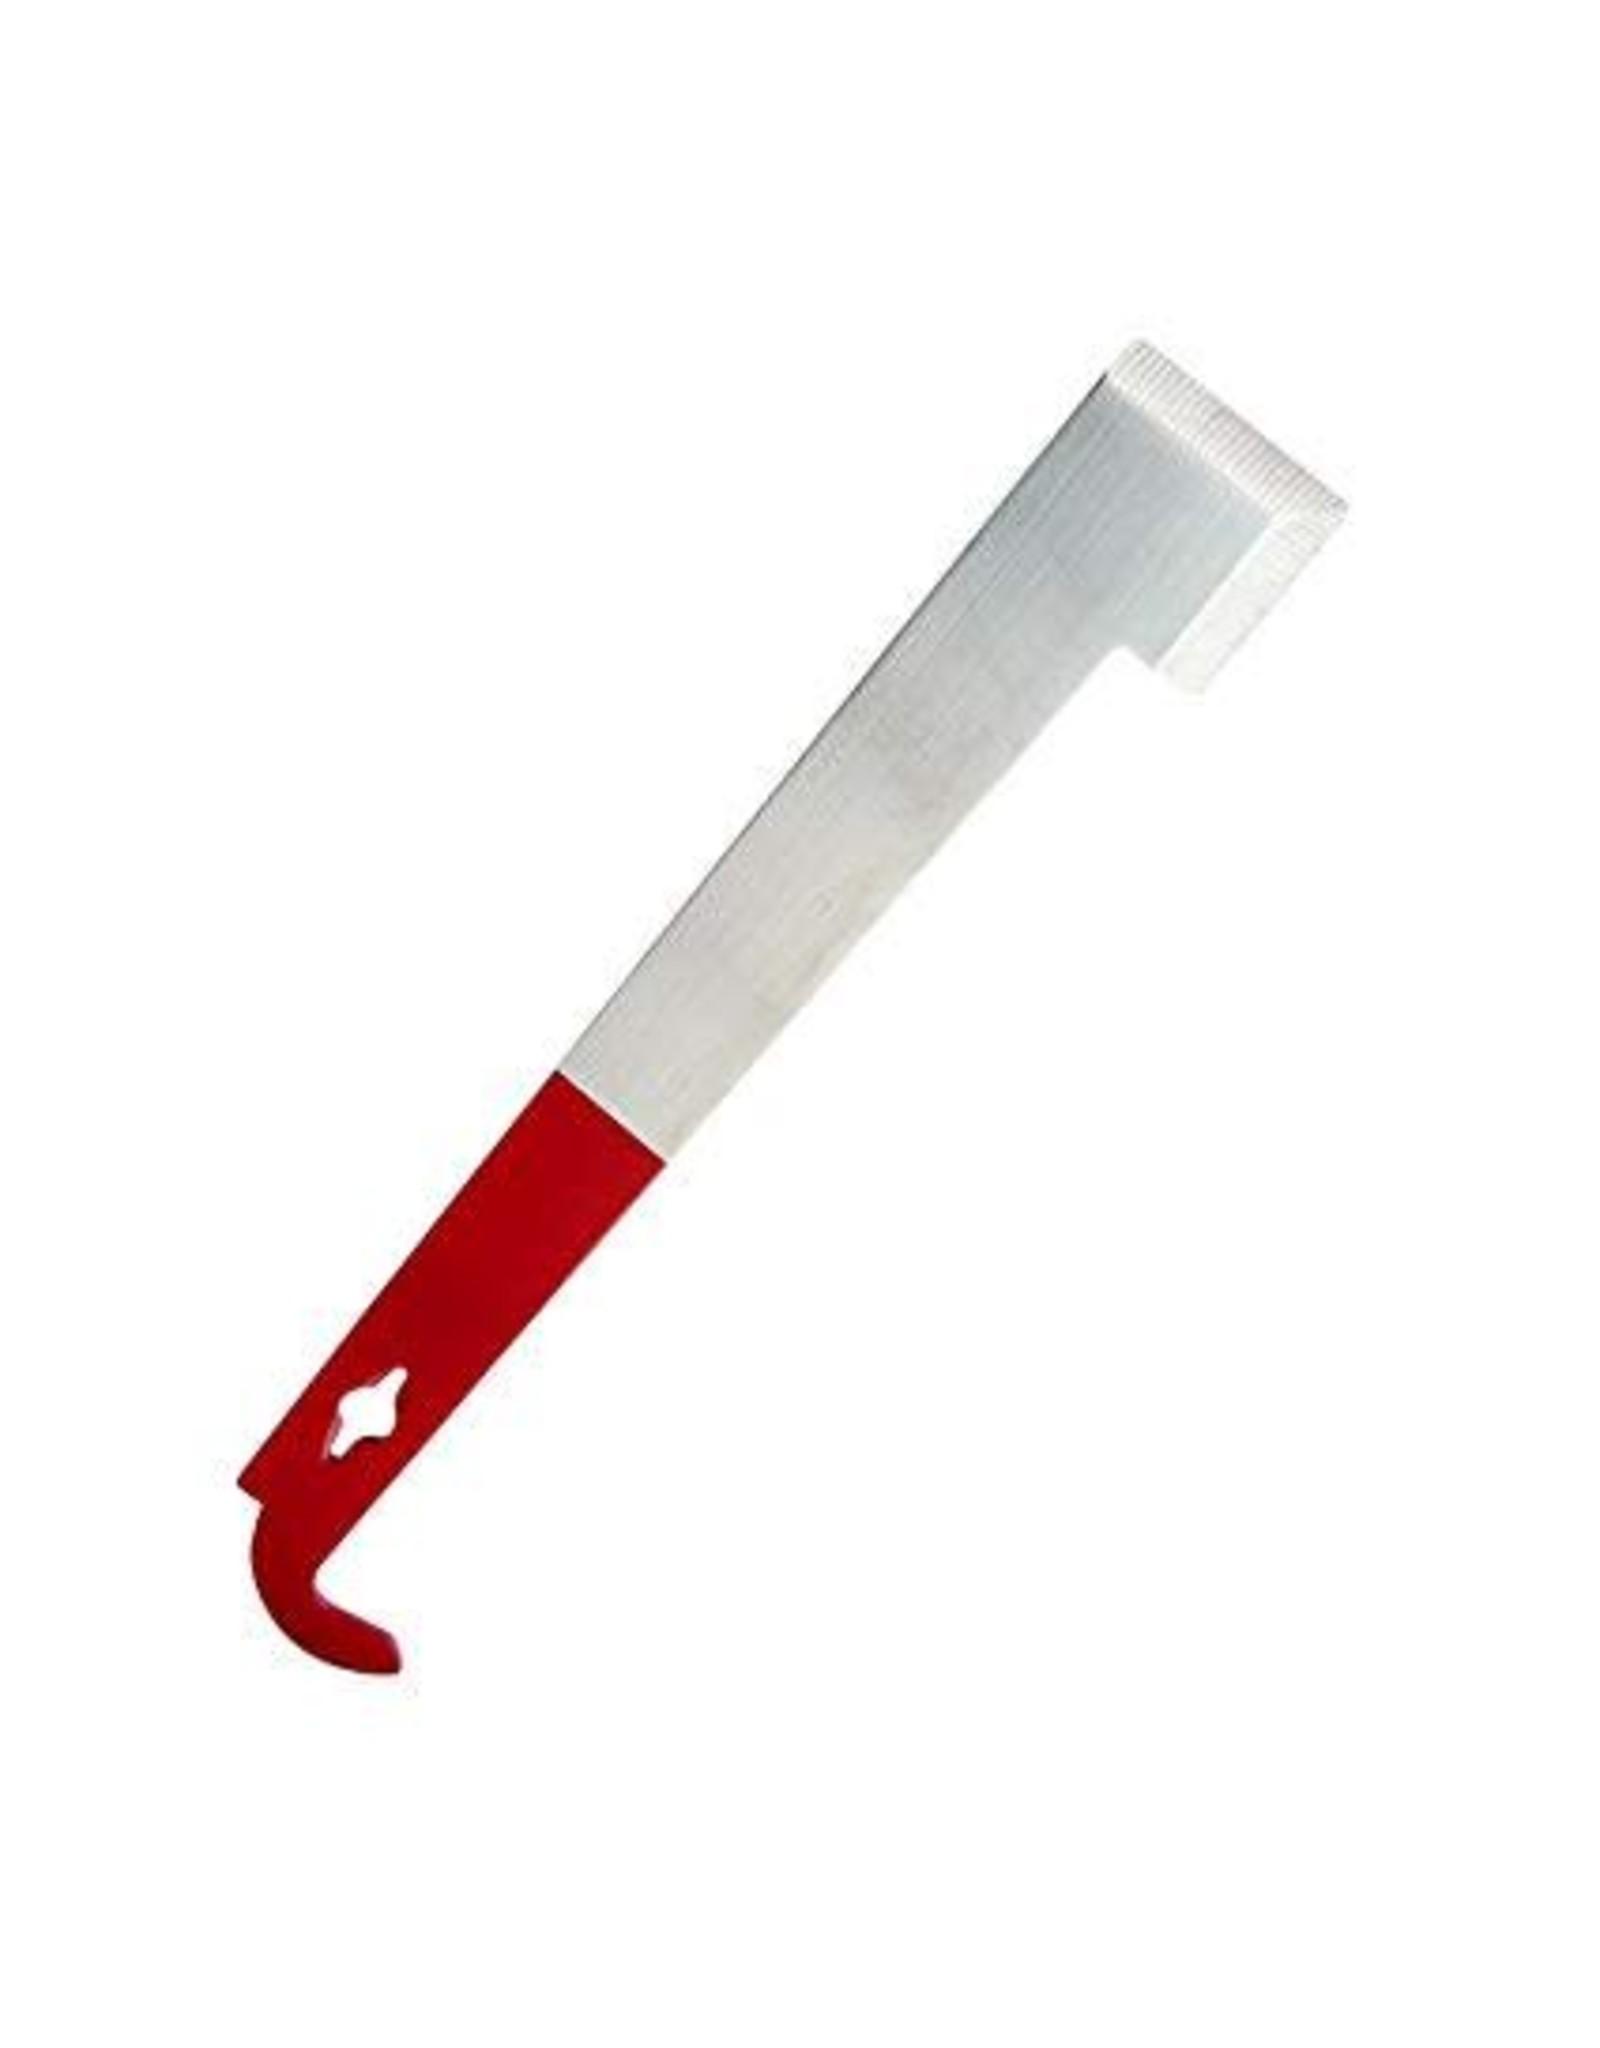 10 1/2'' Frame Lifter and Scraper J Hook Hive Tool